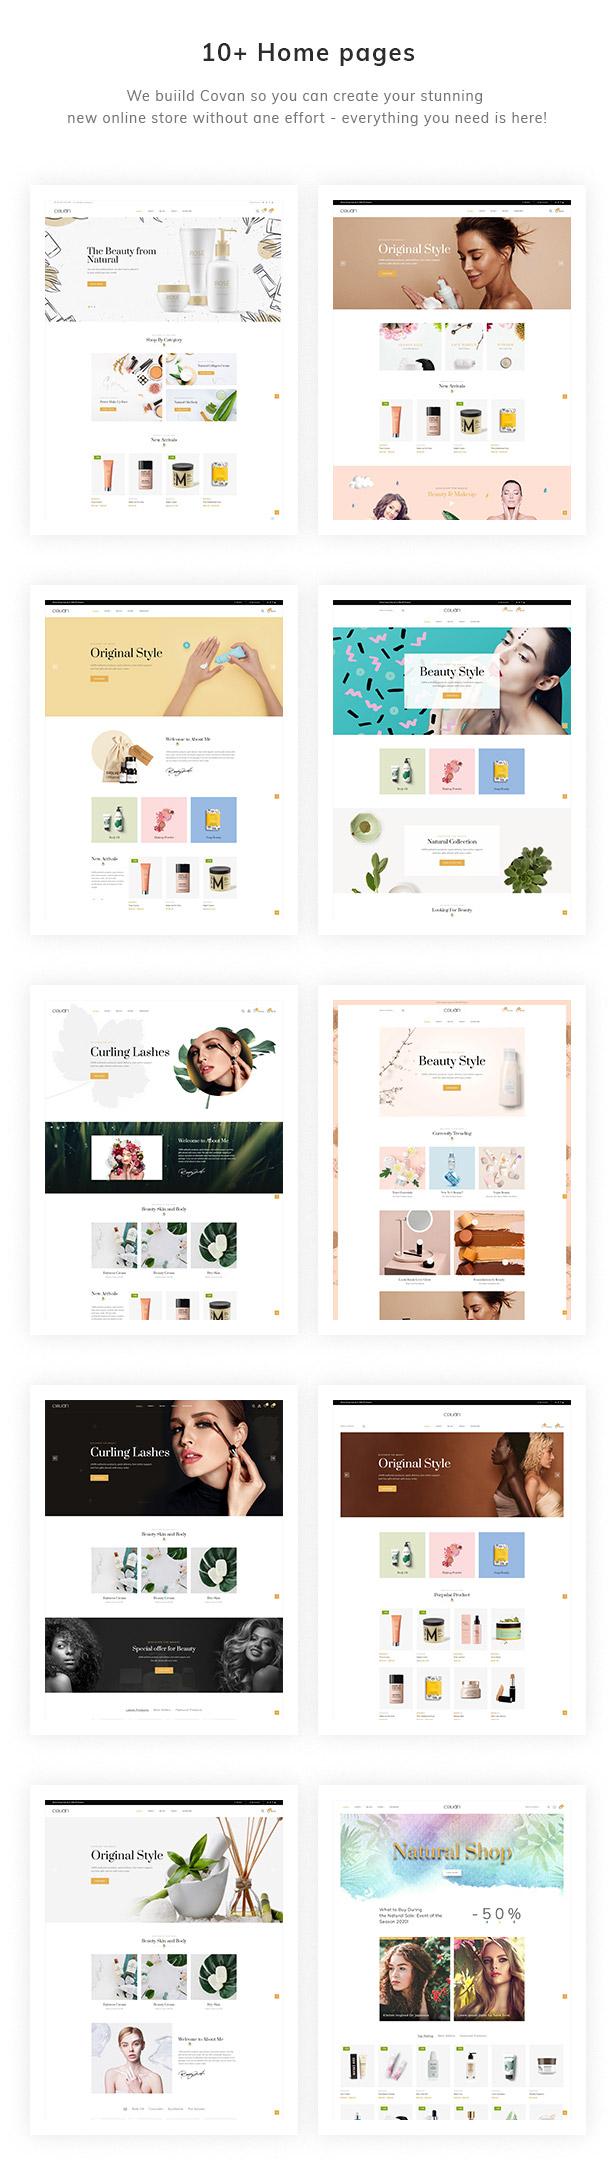 10+ Beauty & Cosmetics Homepage Demos